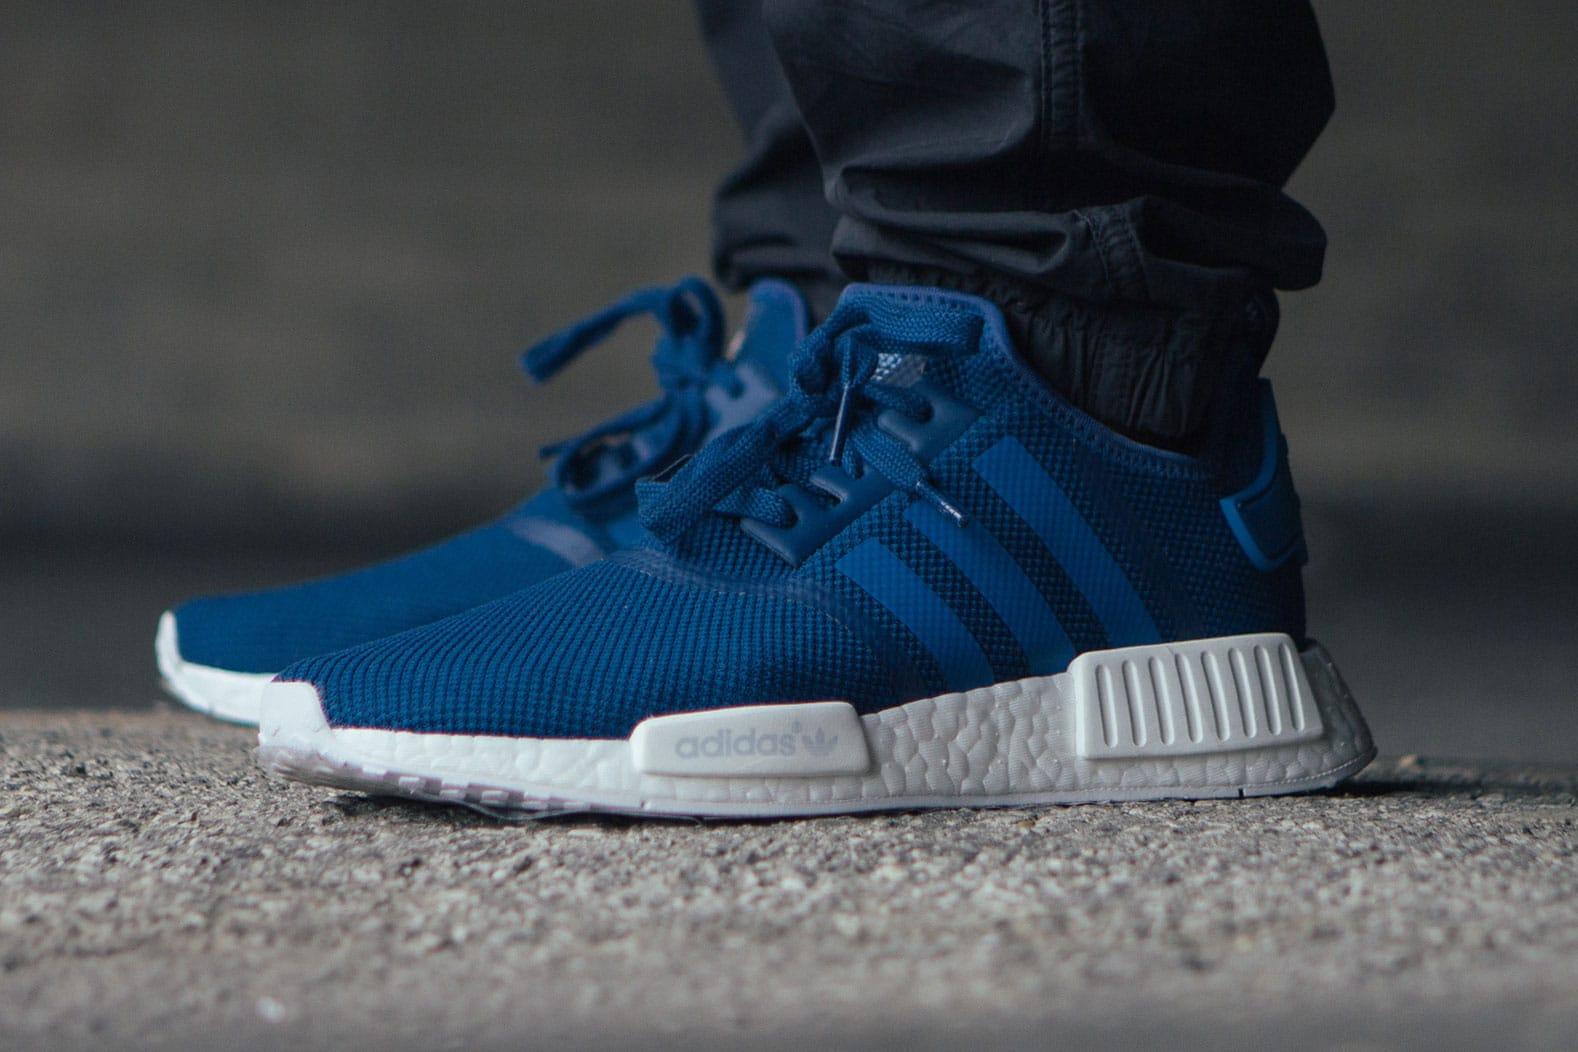 adidas Originals NMD R1 Sneaker in Blue